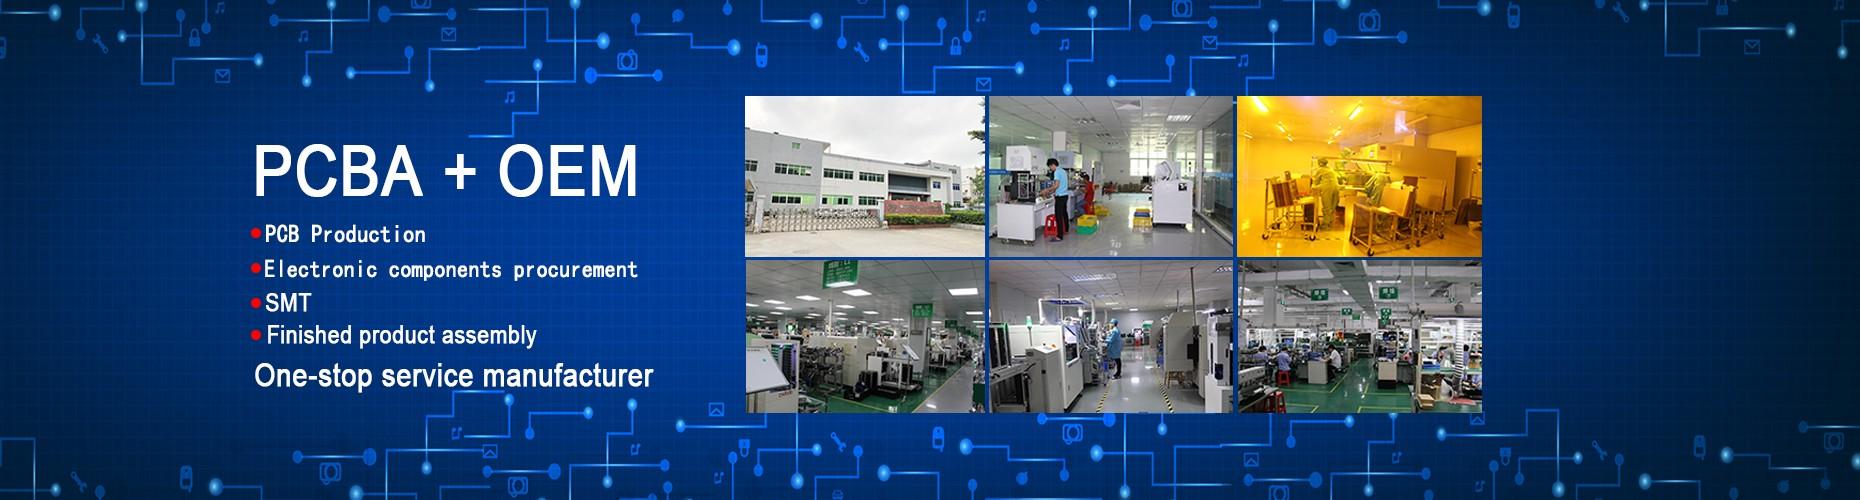 China PCB manufacturer - H C C  International Limited | LinkedIn